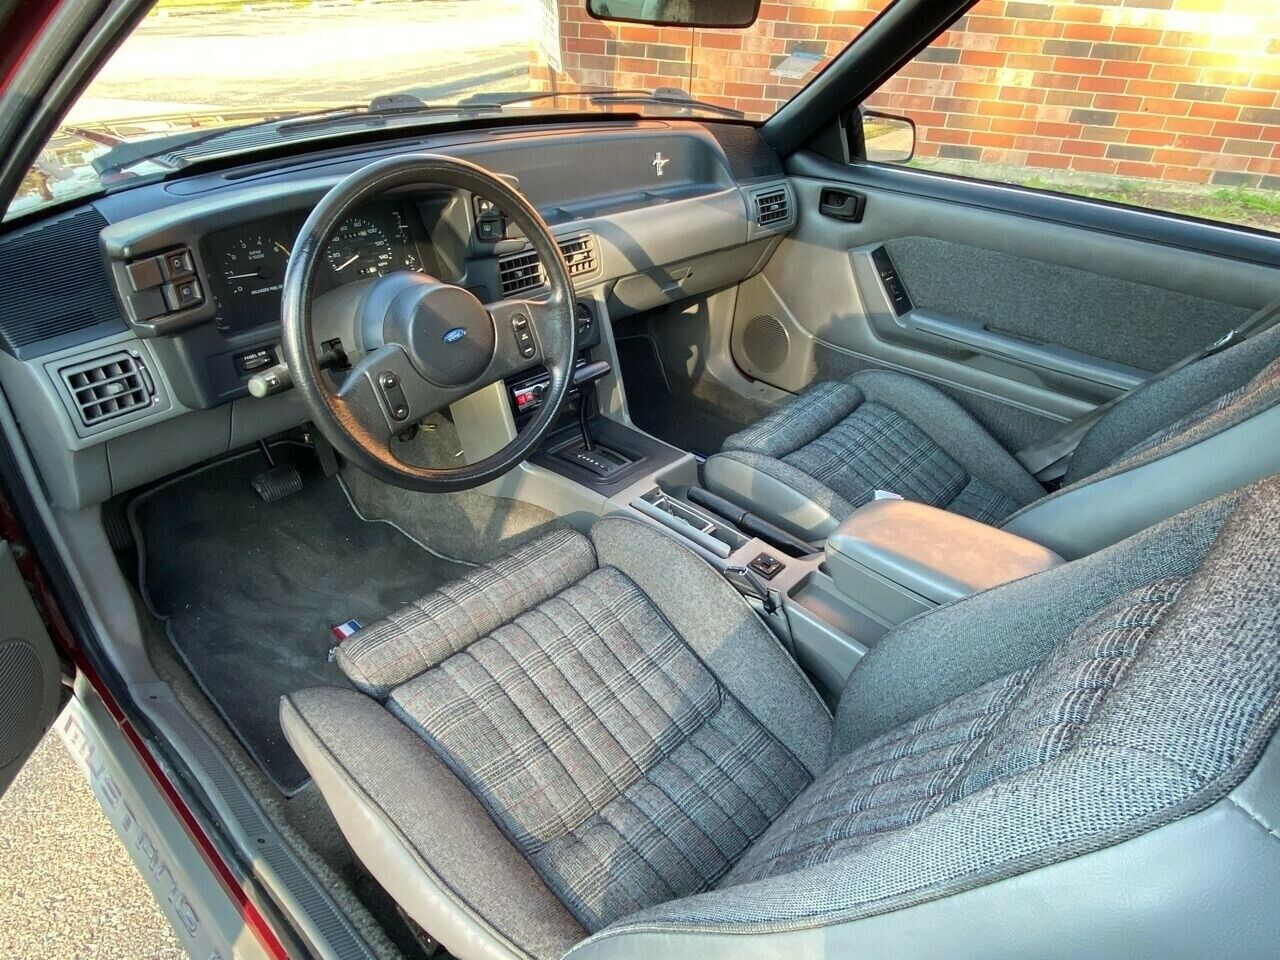 1989 Mustang Gt For Sale Ebay